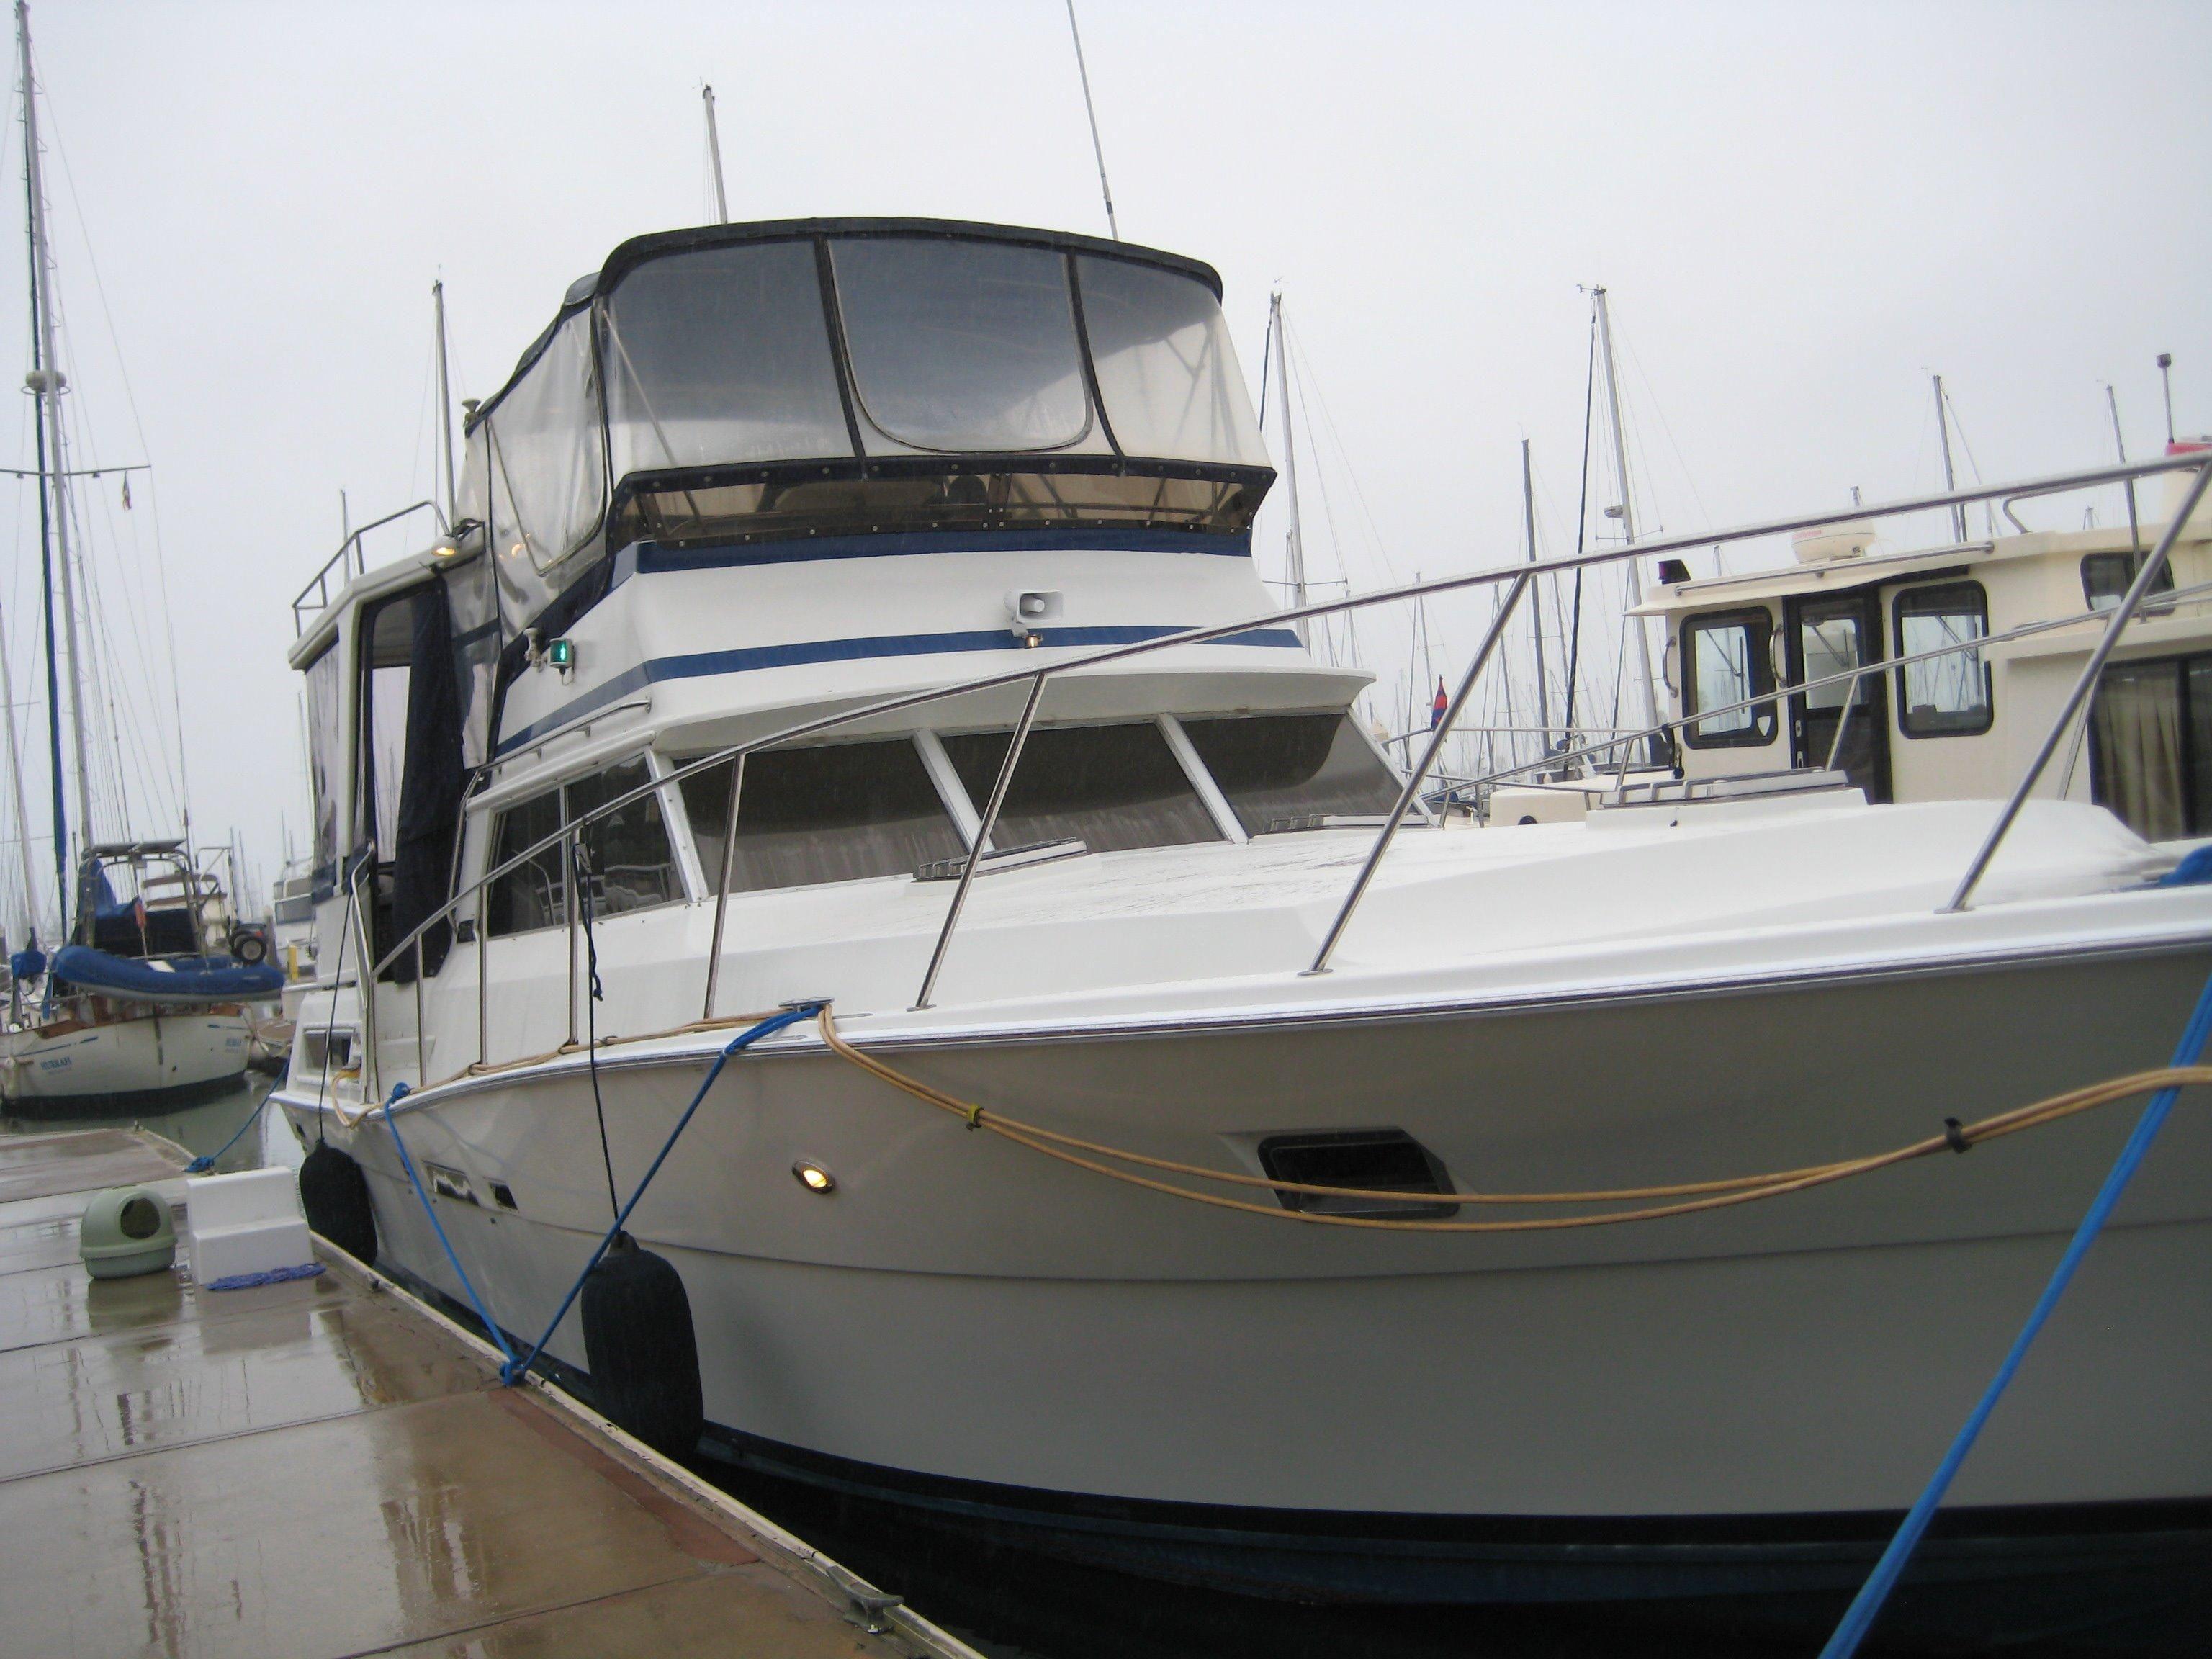 1978 viking double cabin power boat for sale www for Viking 43 double cabin motor yacht